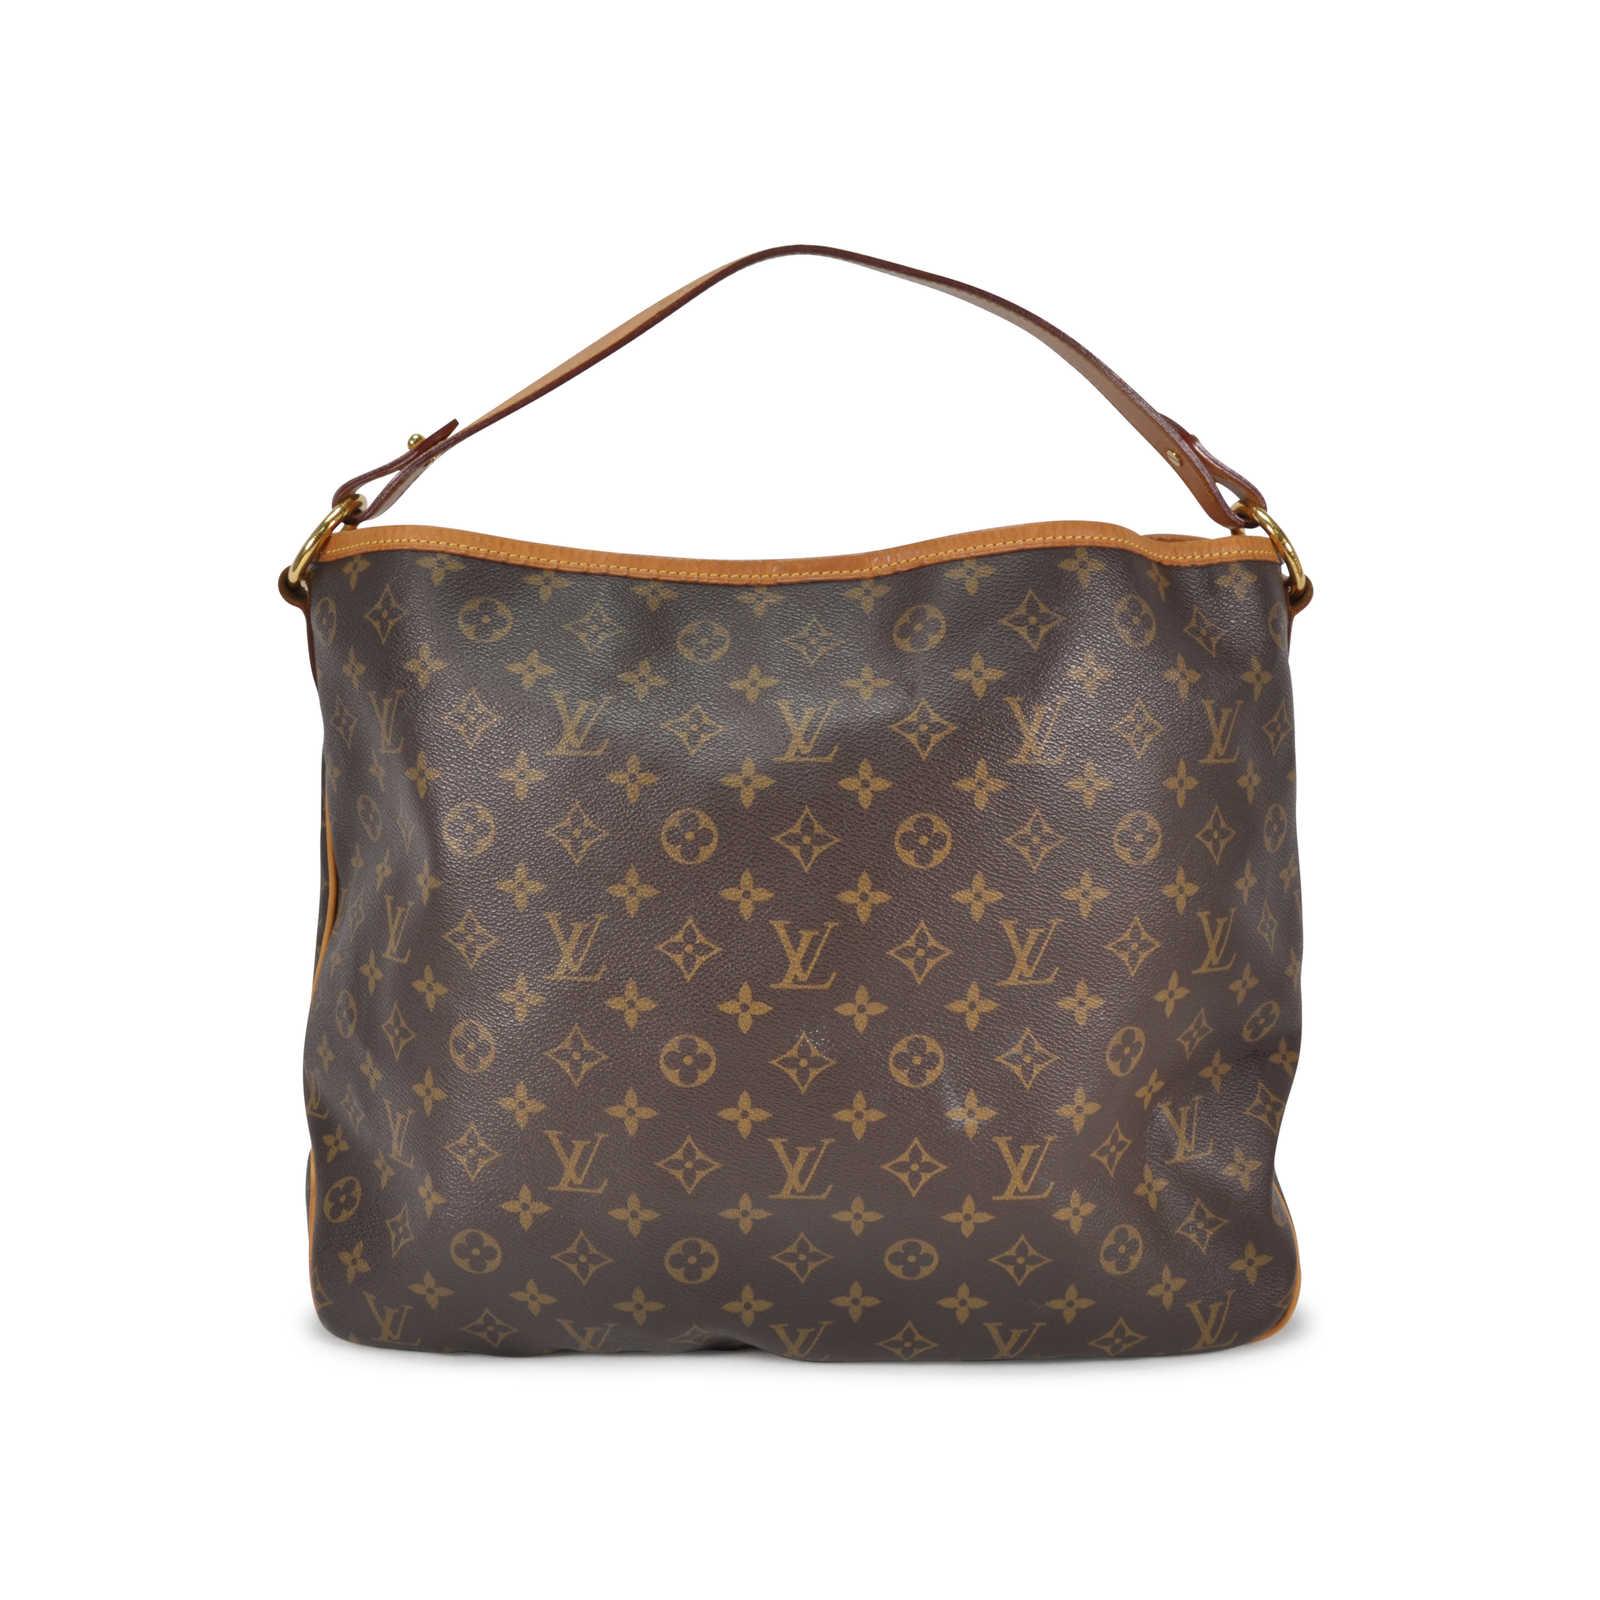 louis vuitton monogram handbags second hand handbags 2018. Black Bedroom Furniture Sets. Home Design Ideas